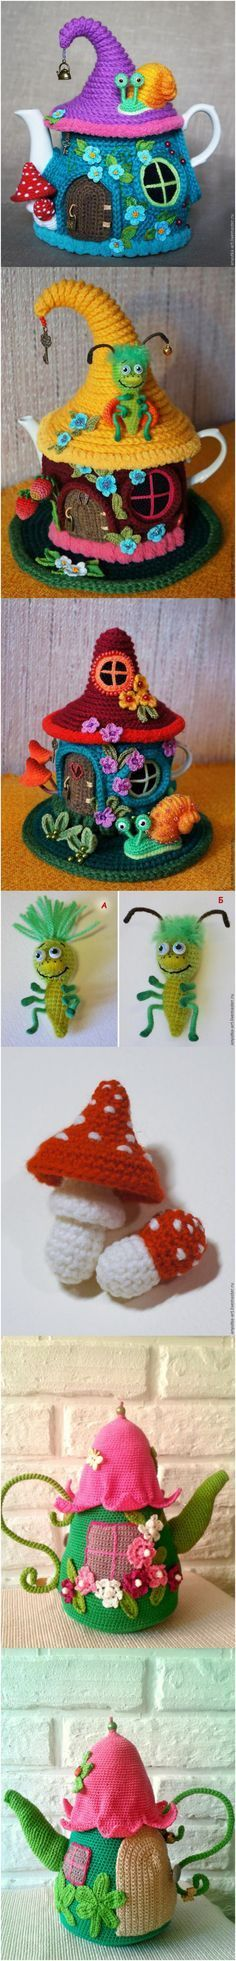 10+ Handmade Tea Cozy with Patterns - Cool Creativities